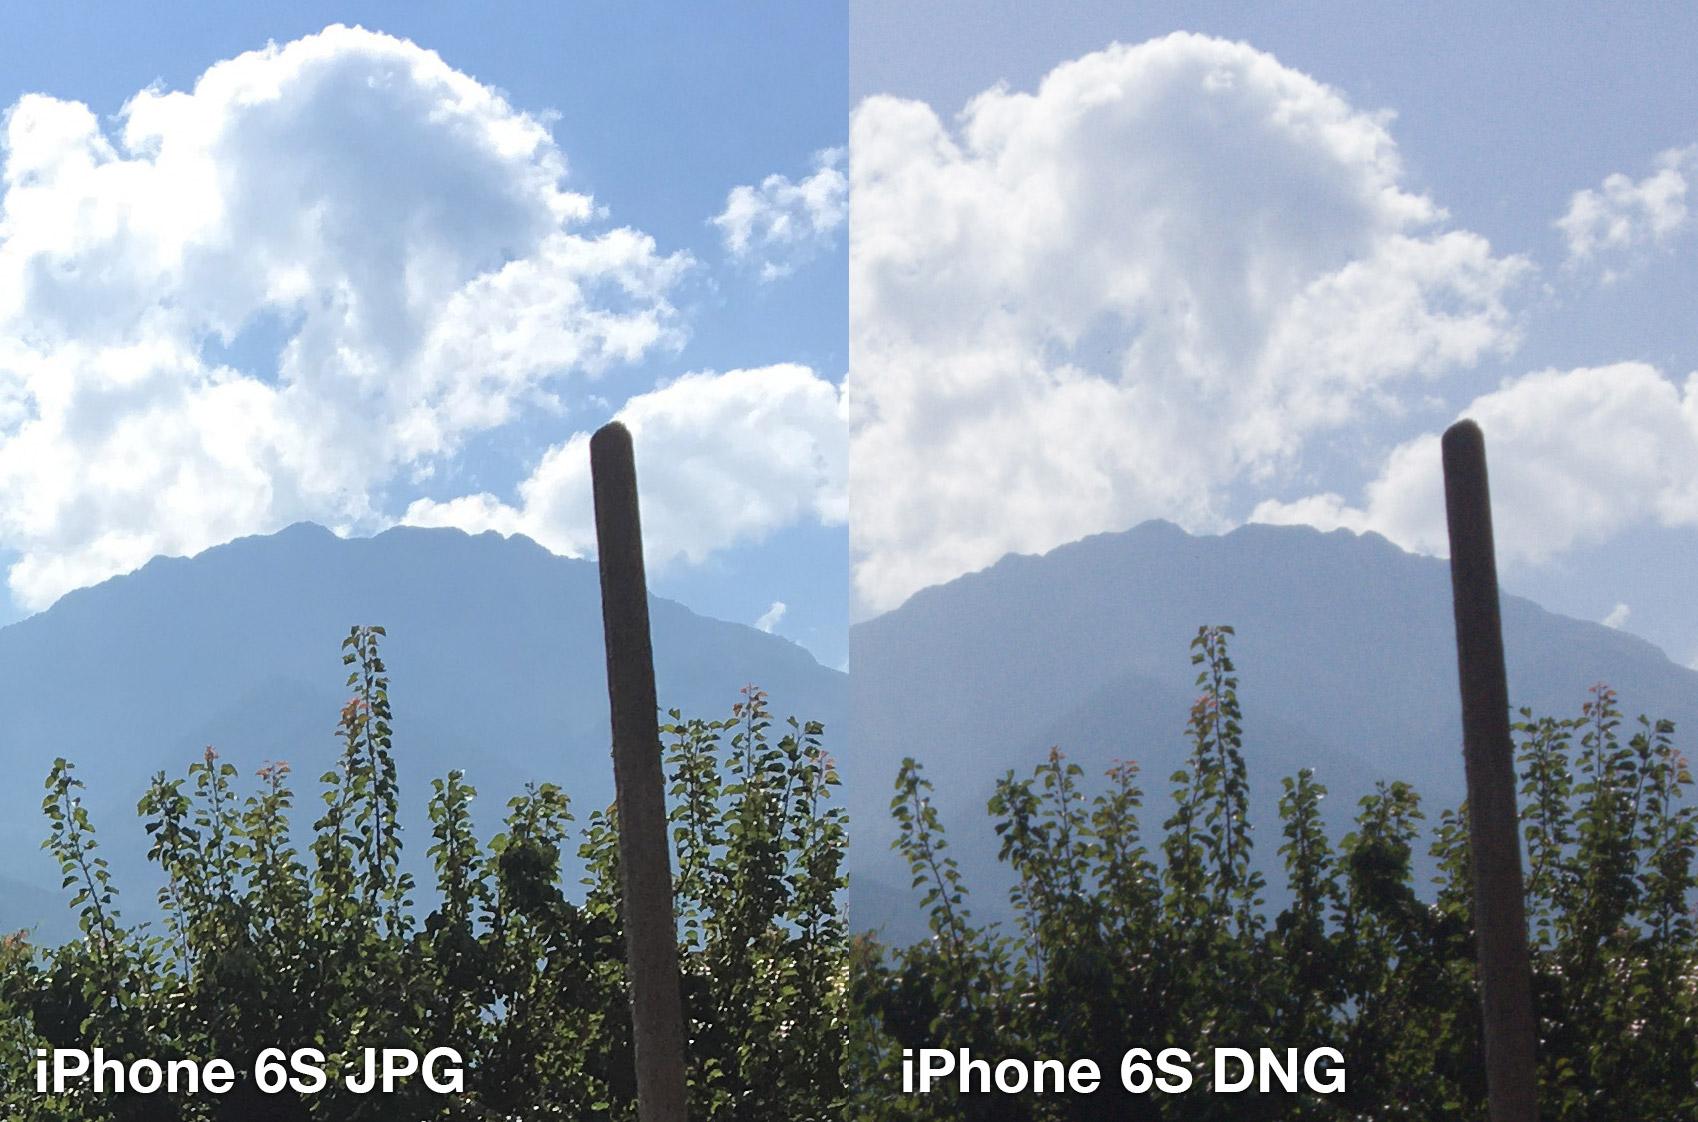 iphone-6s-lightroom-jpg-vs-dng-5